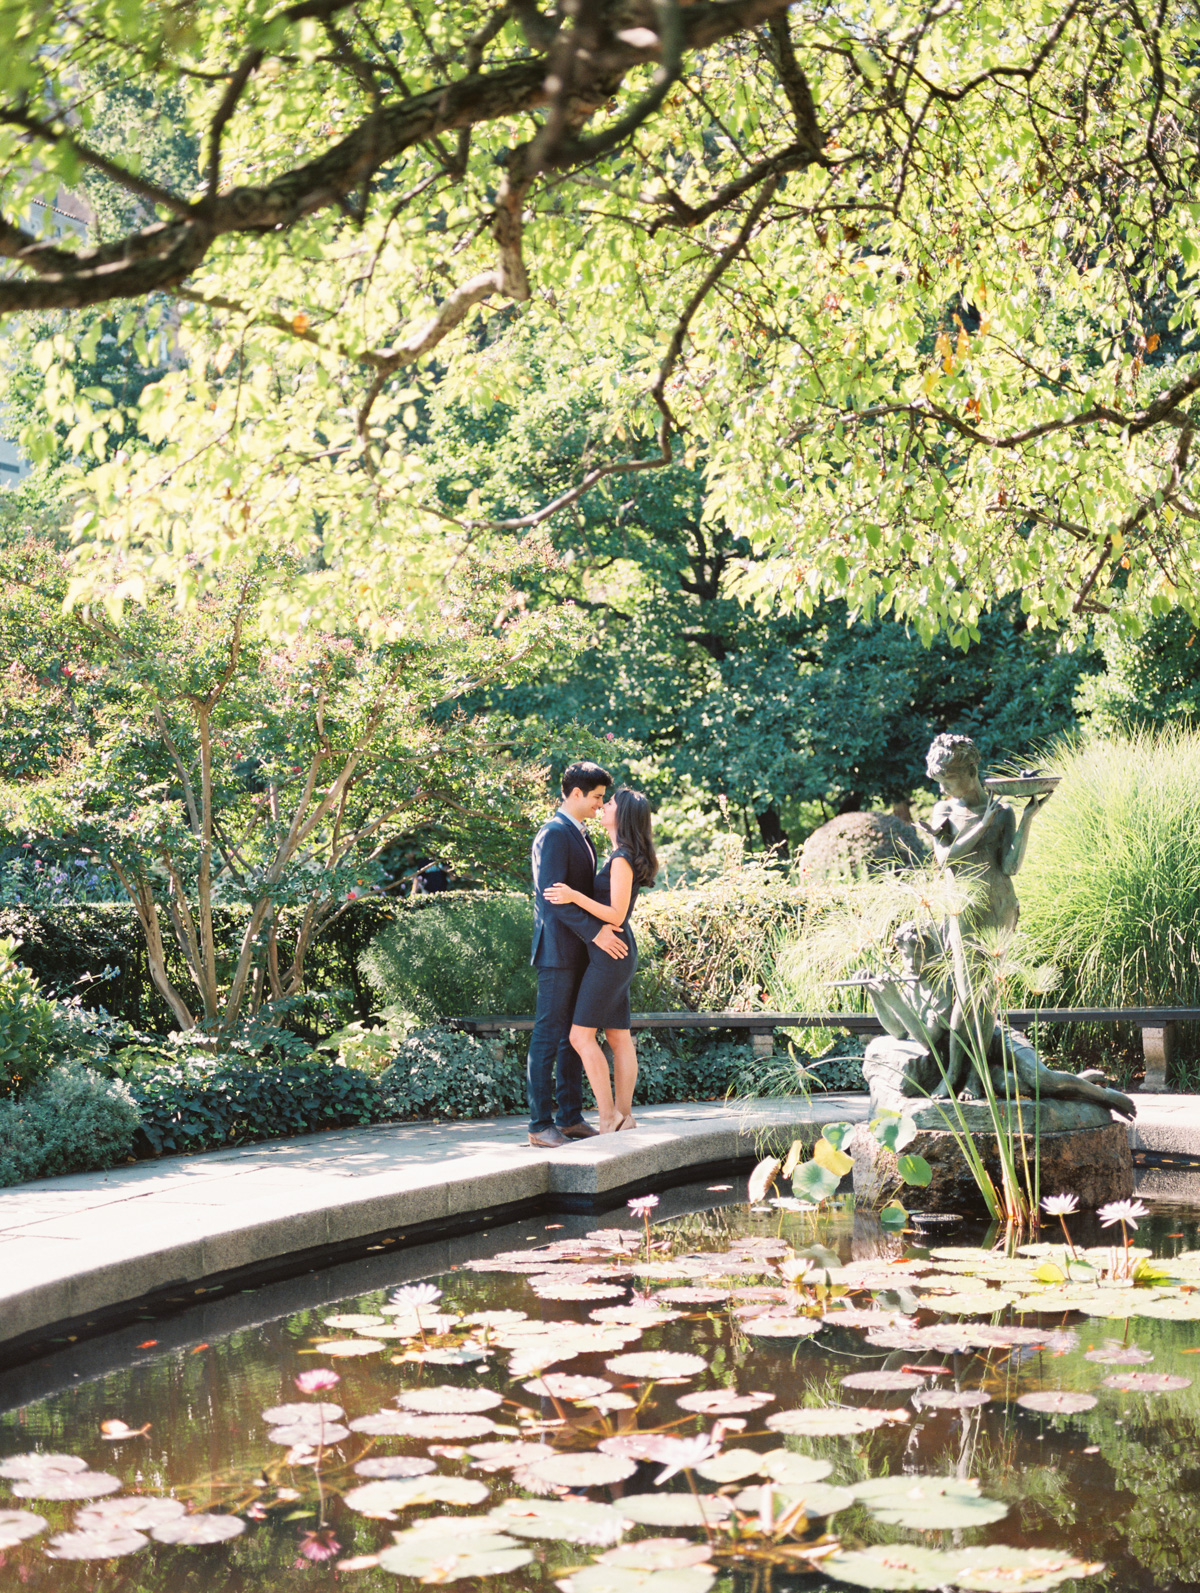 conservatory-garden-engagement-2.jpg